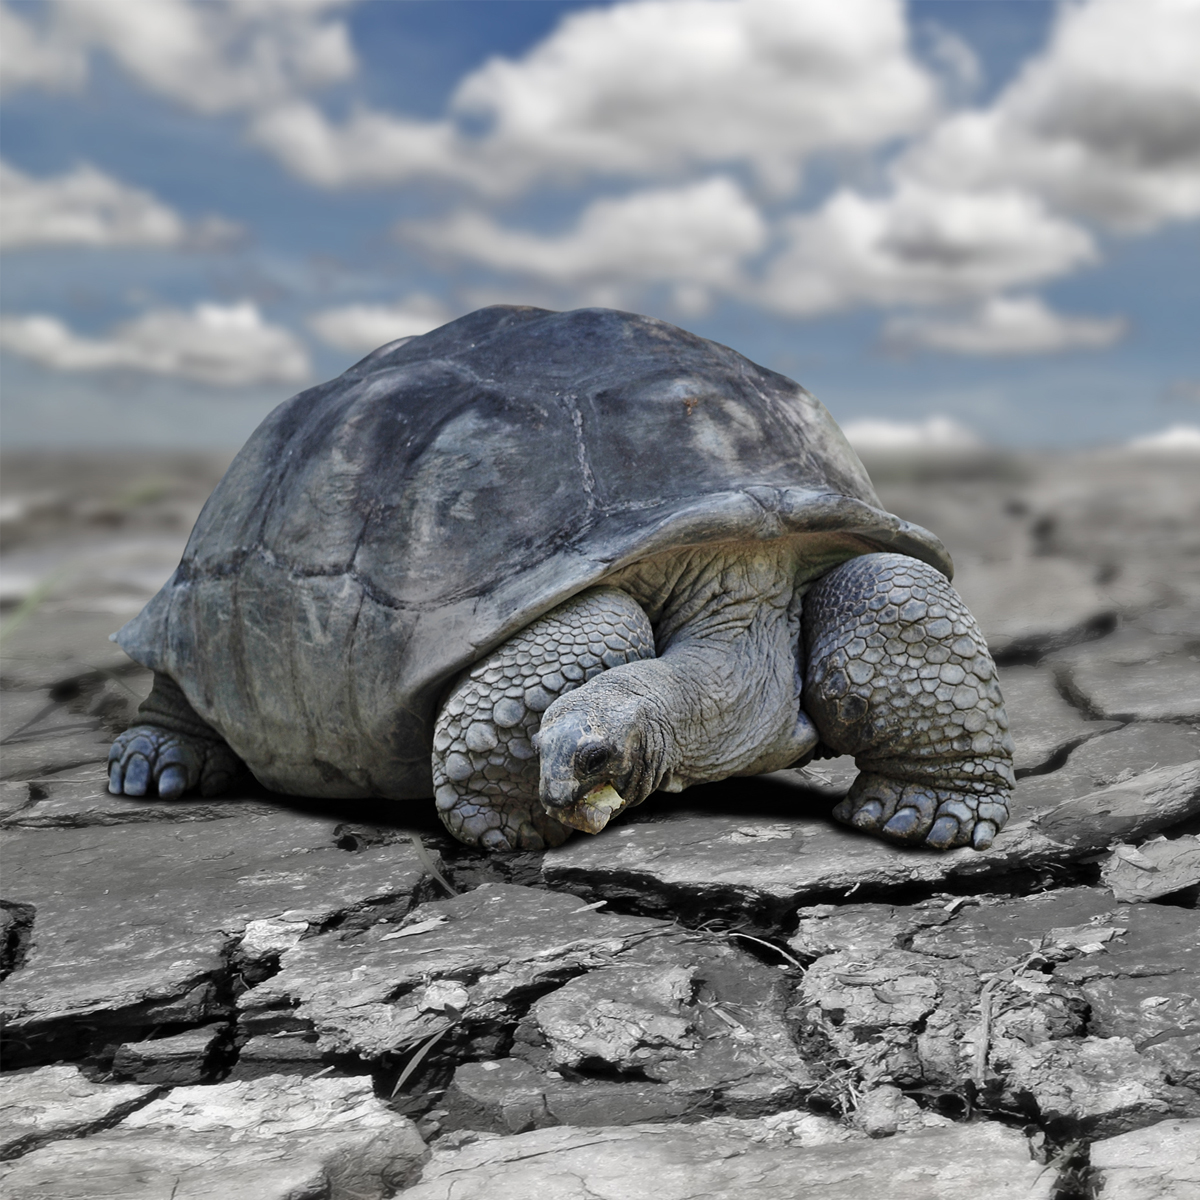 Aldabra Tortoise (Aldabrachelys gigantea) | about animals